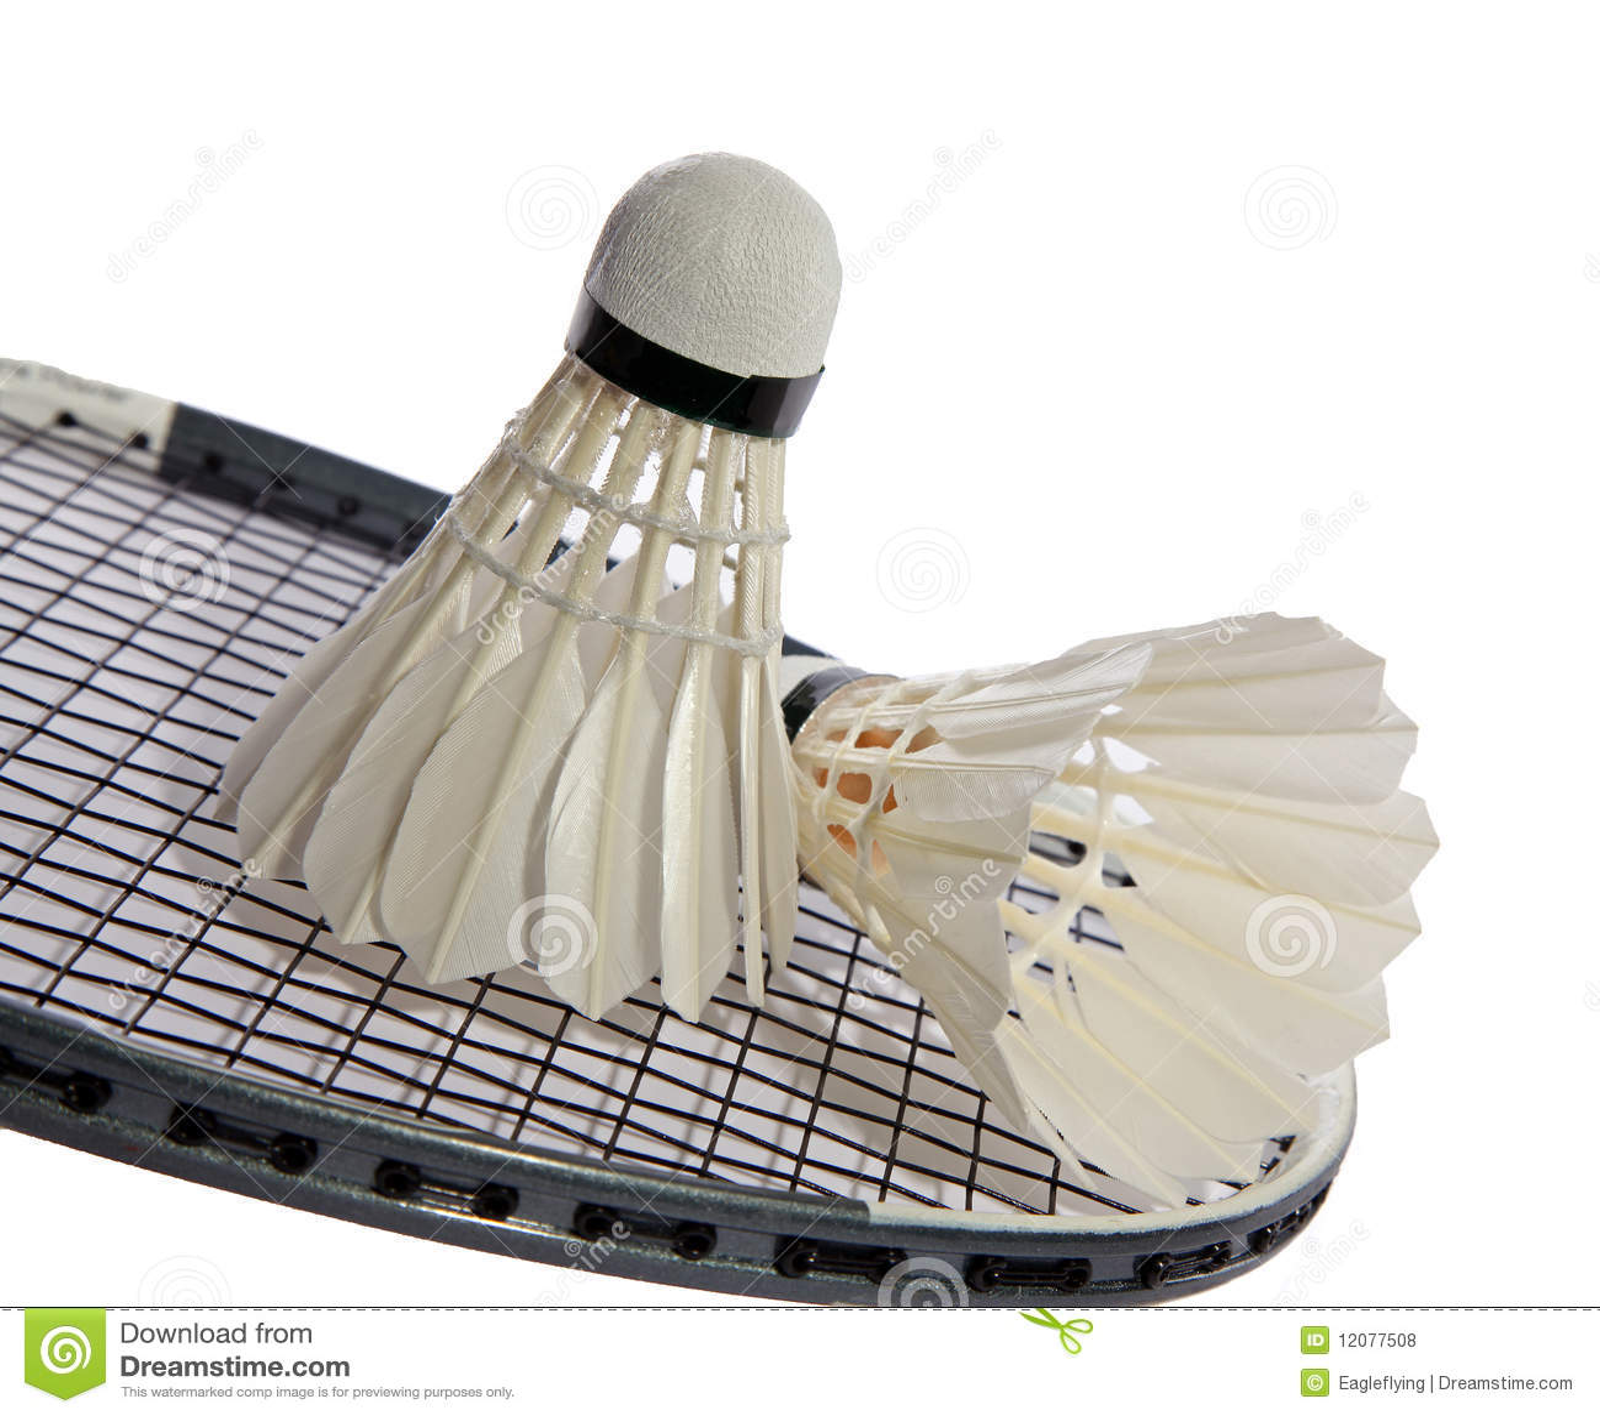 Closeup of badminton racket and shuttlecock